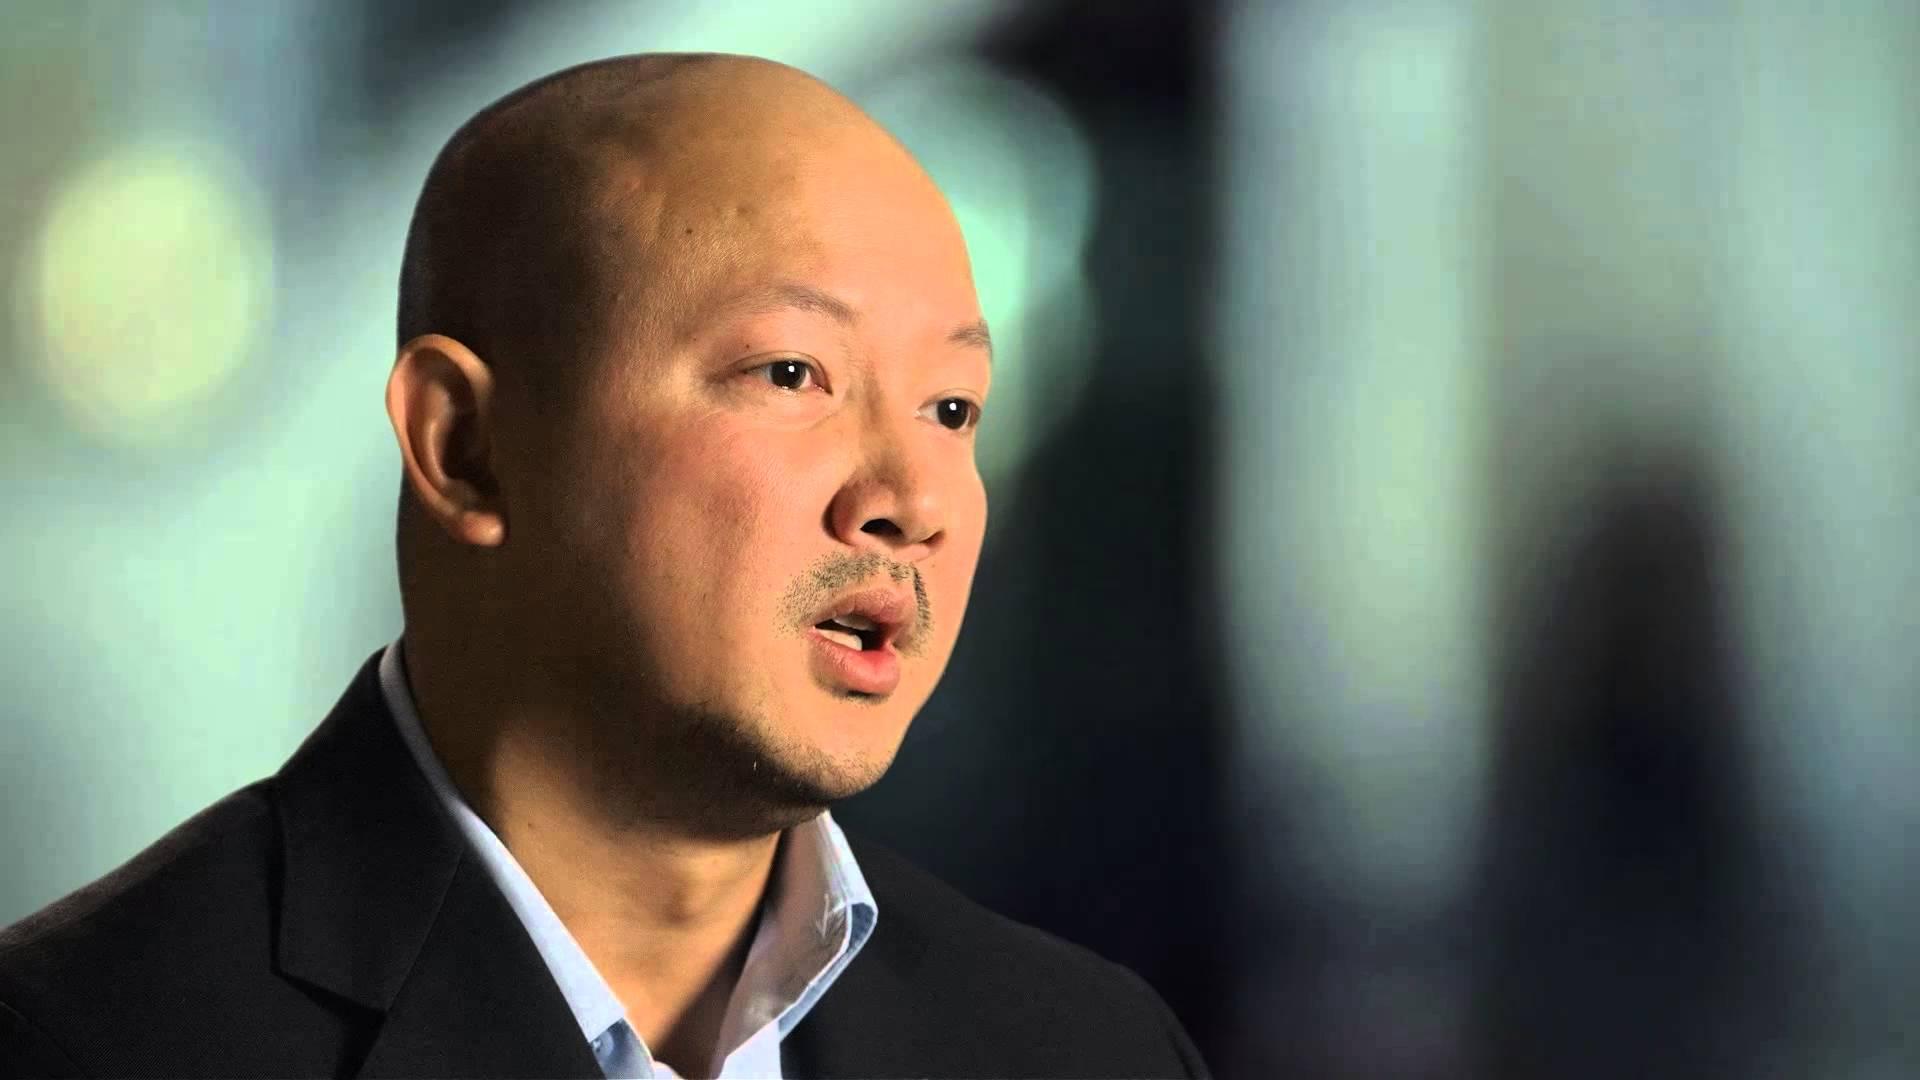 Thod Nguyen, in a YouTube video by IBM (https://www.youtube.com/watch?v=1AePeB7iCpI)